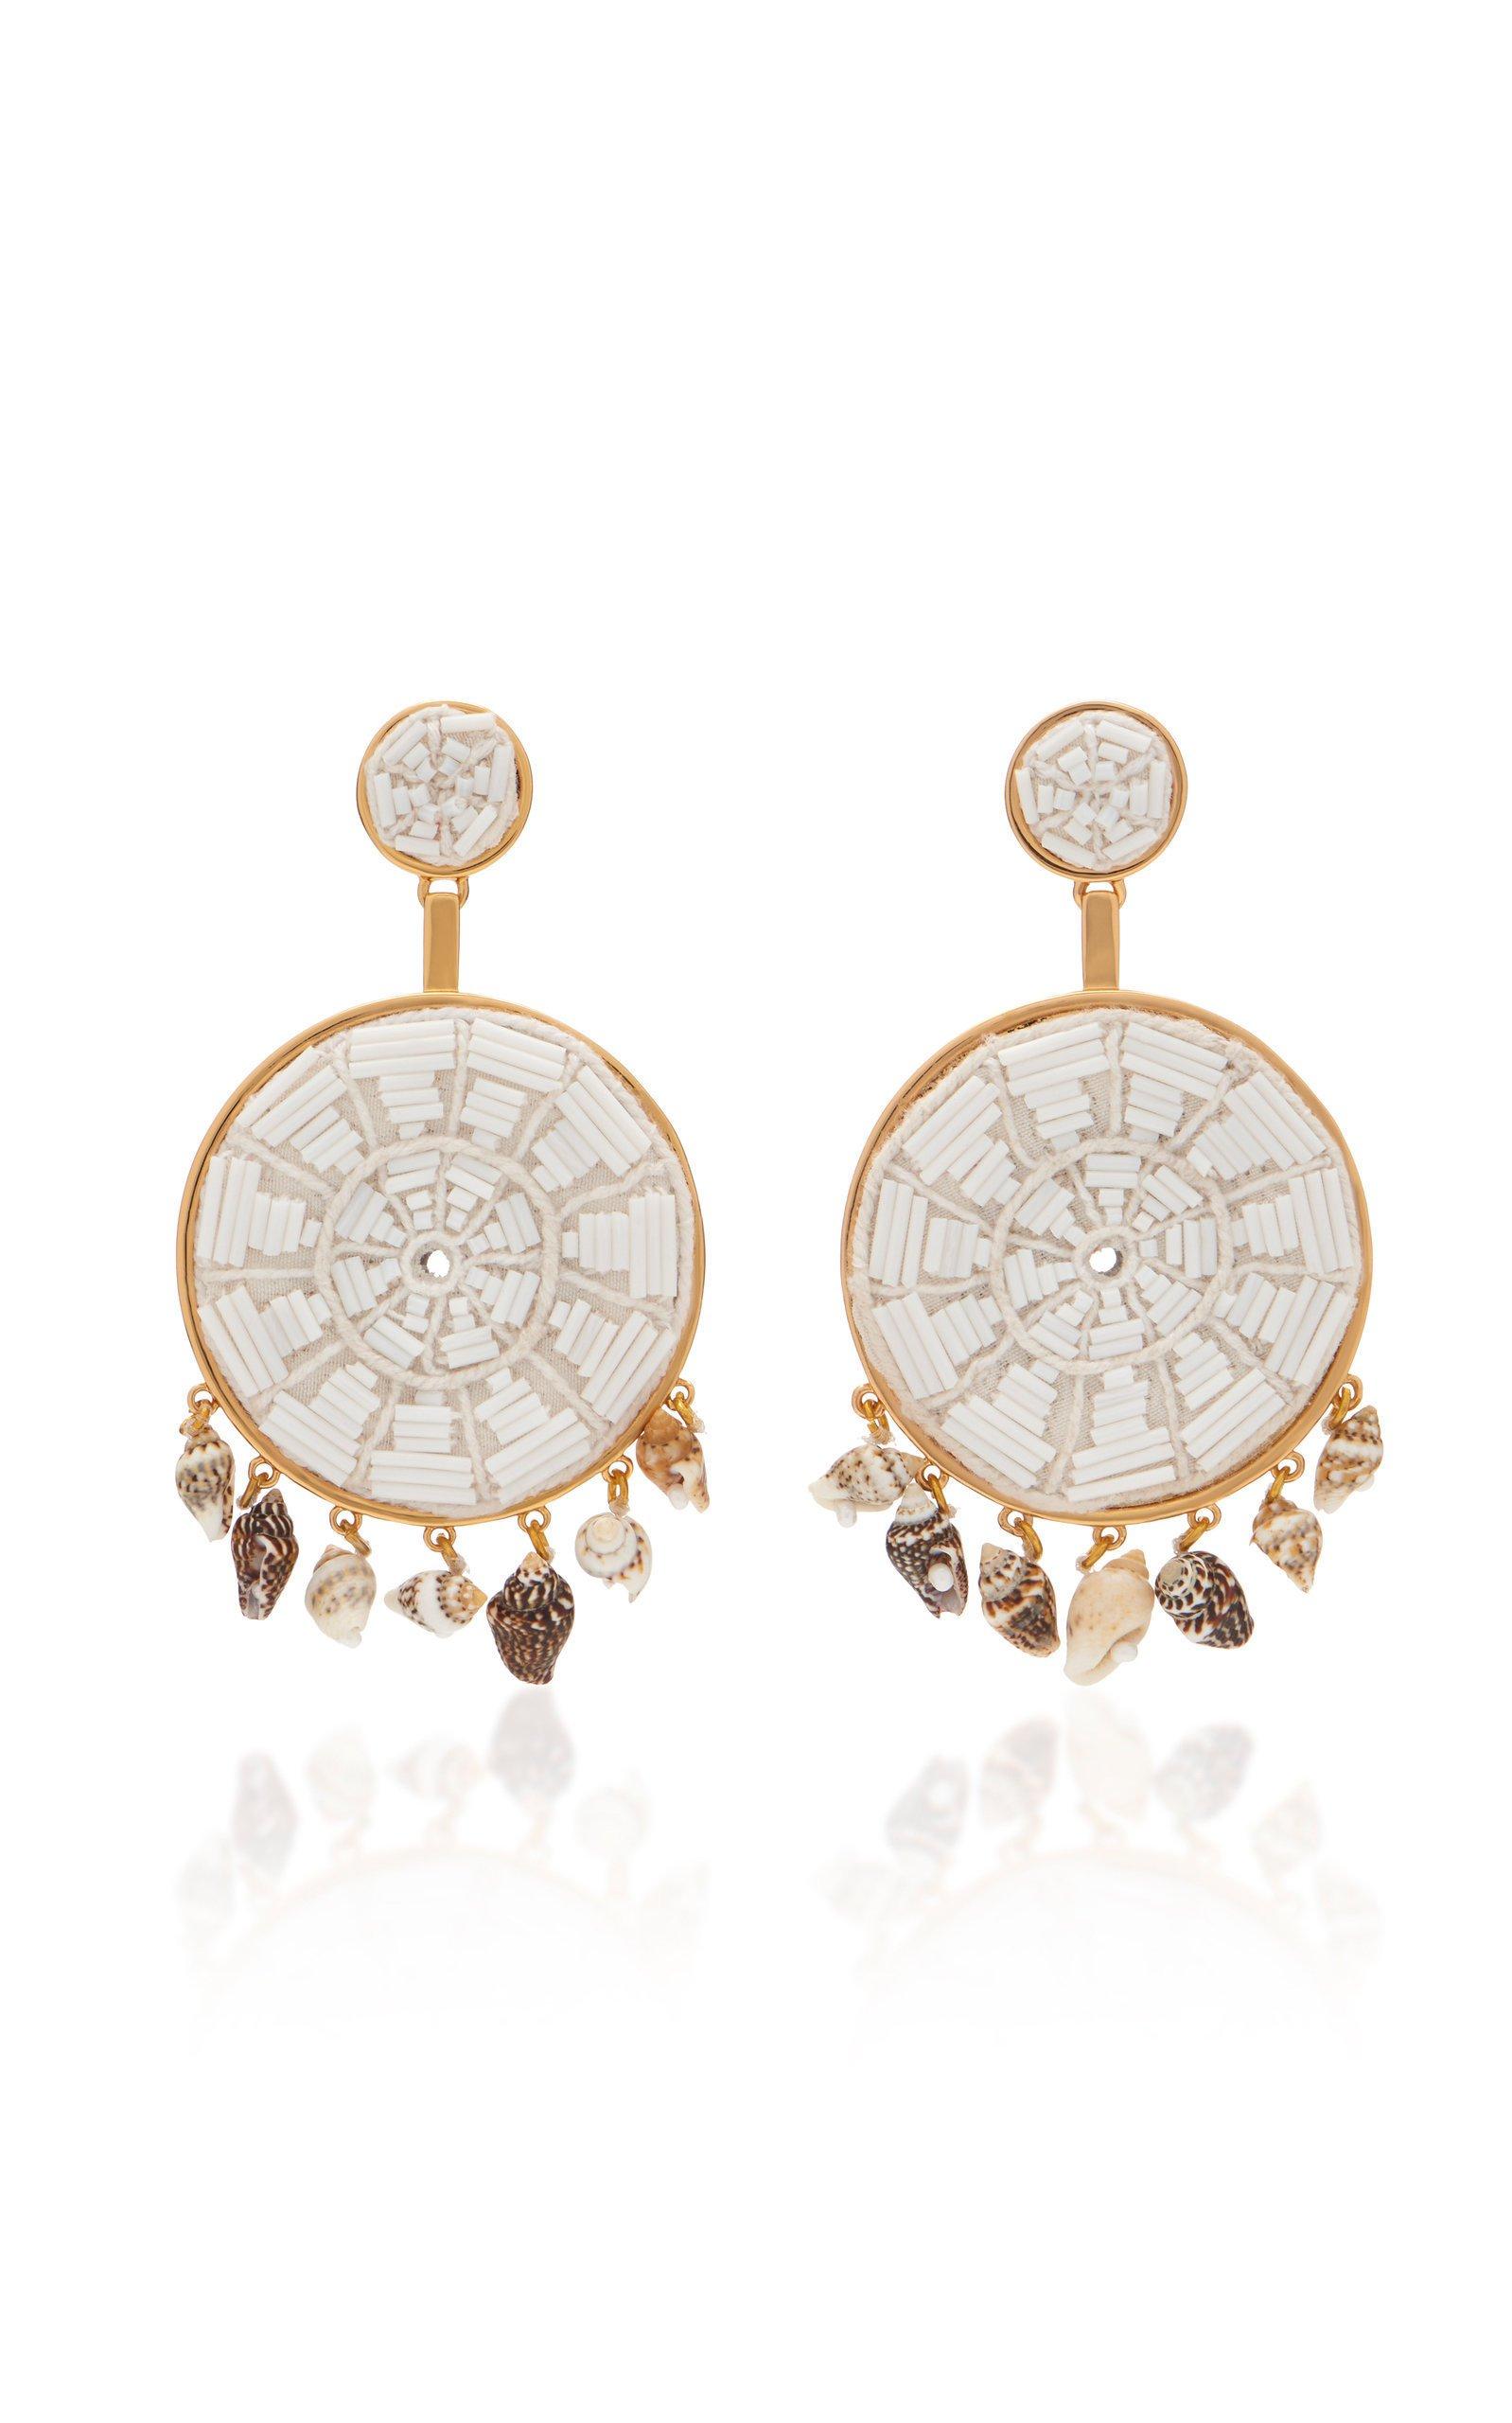 Mignonne Gavigan Rachel Beaded Faux Shell And Cotton Earrings